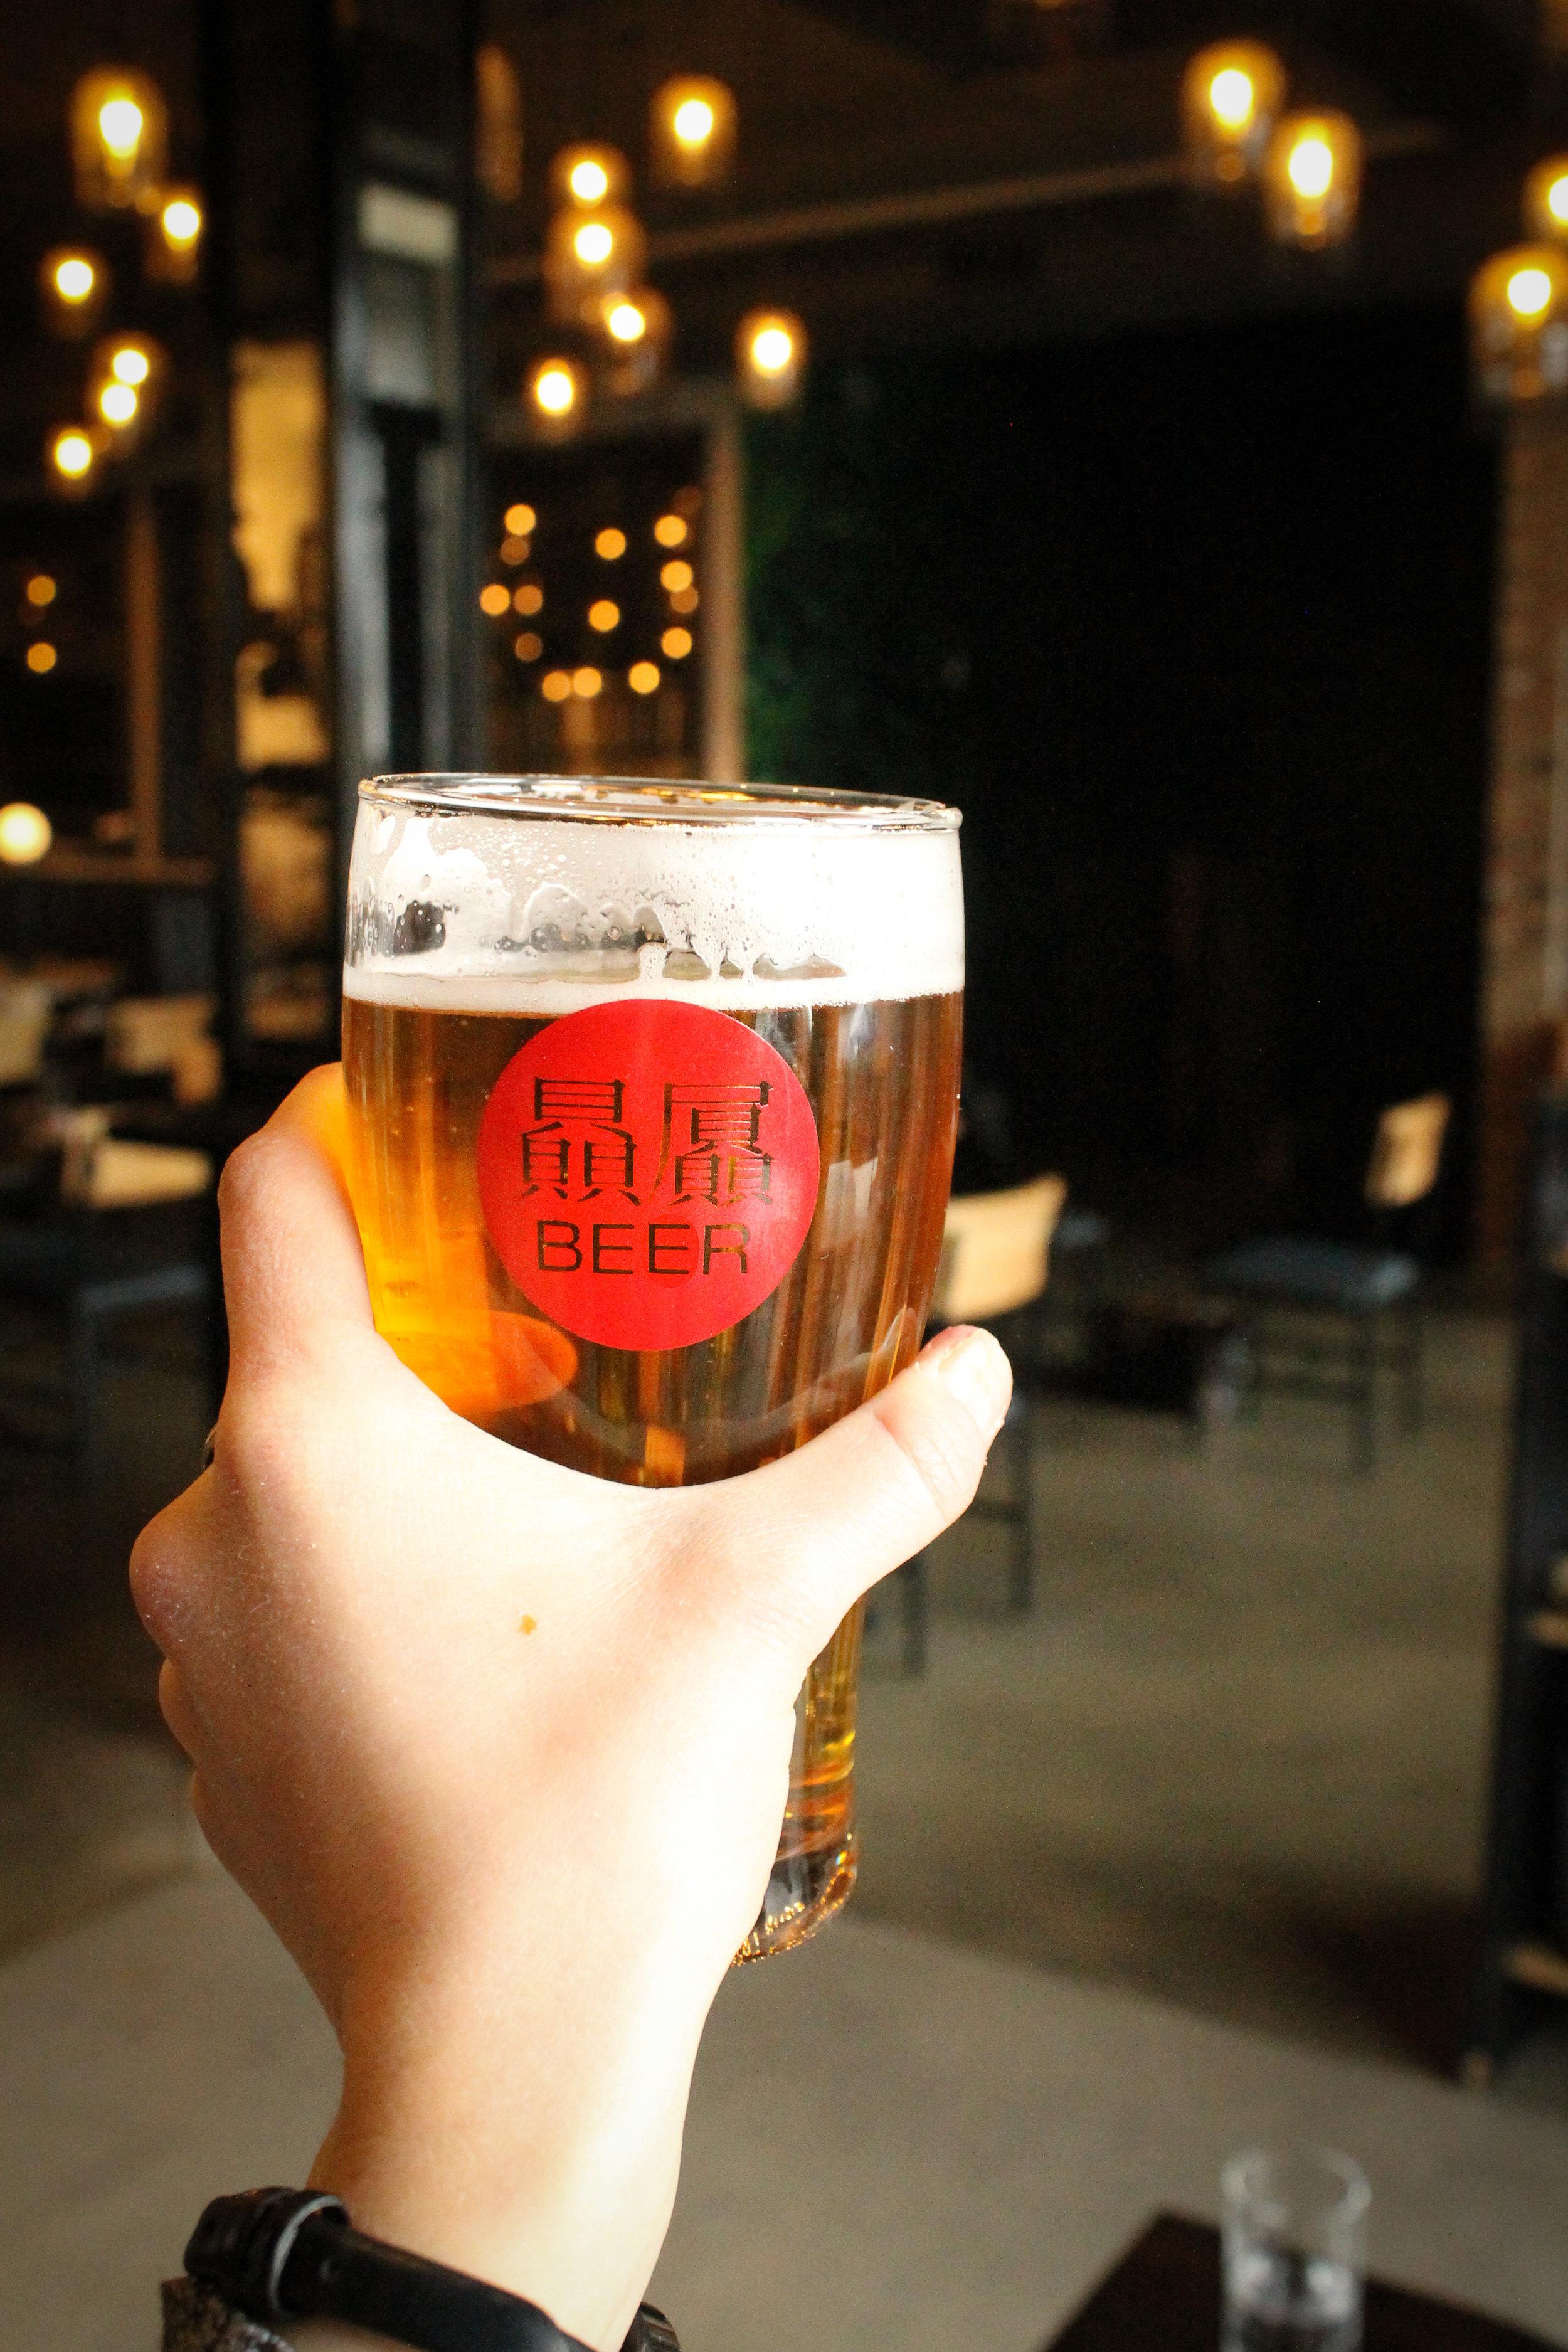 BiXI Beer, Logan Square's newest gastropub